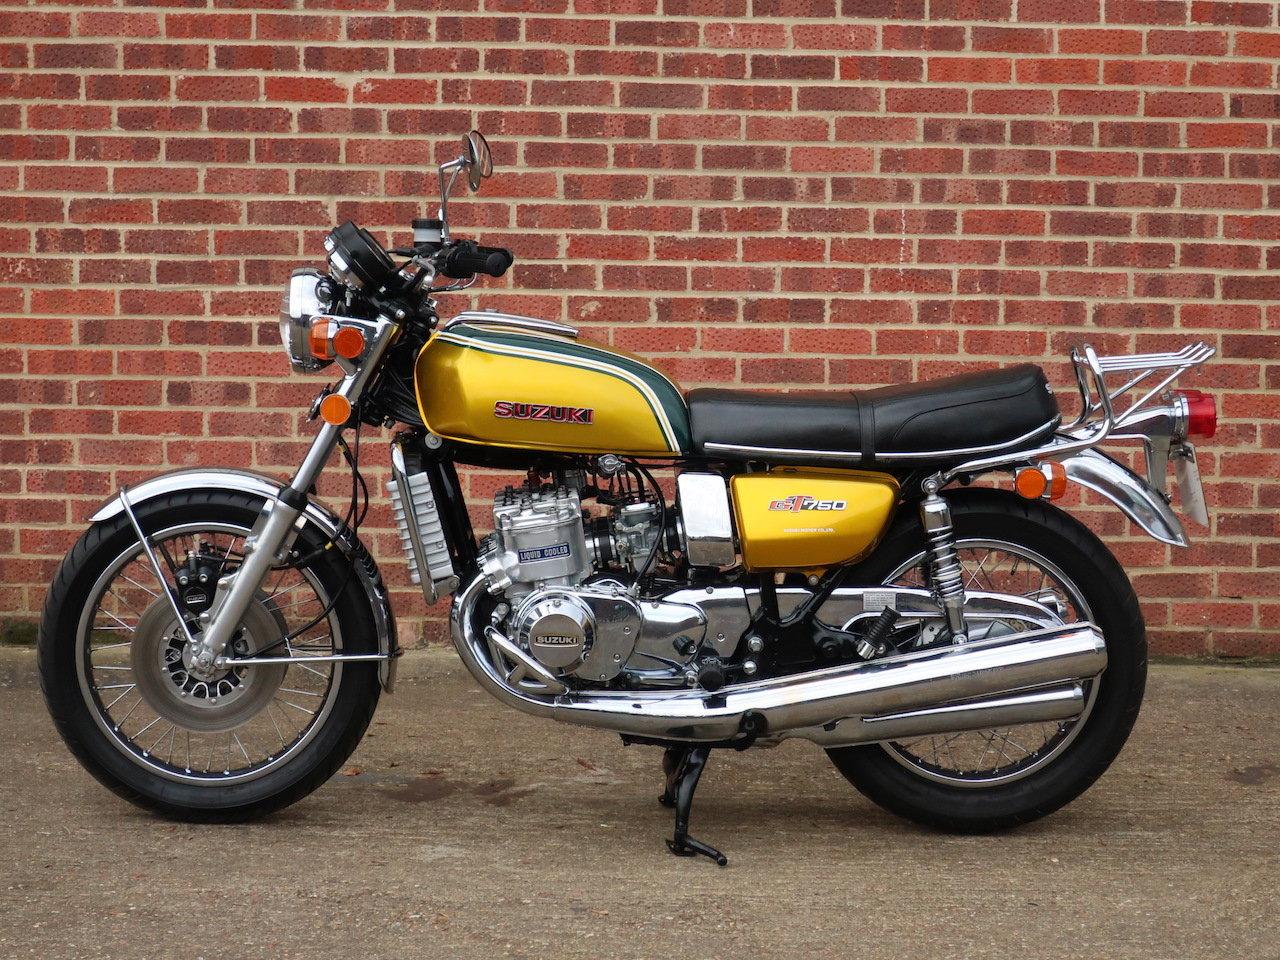 1976 Suzuki GT750 For Sale (picture 4 of 6)